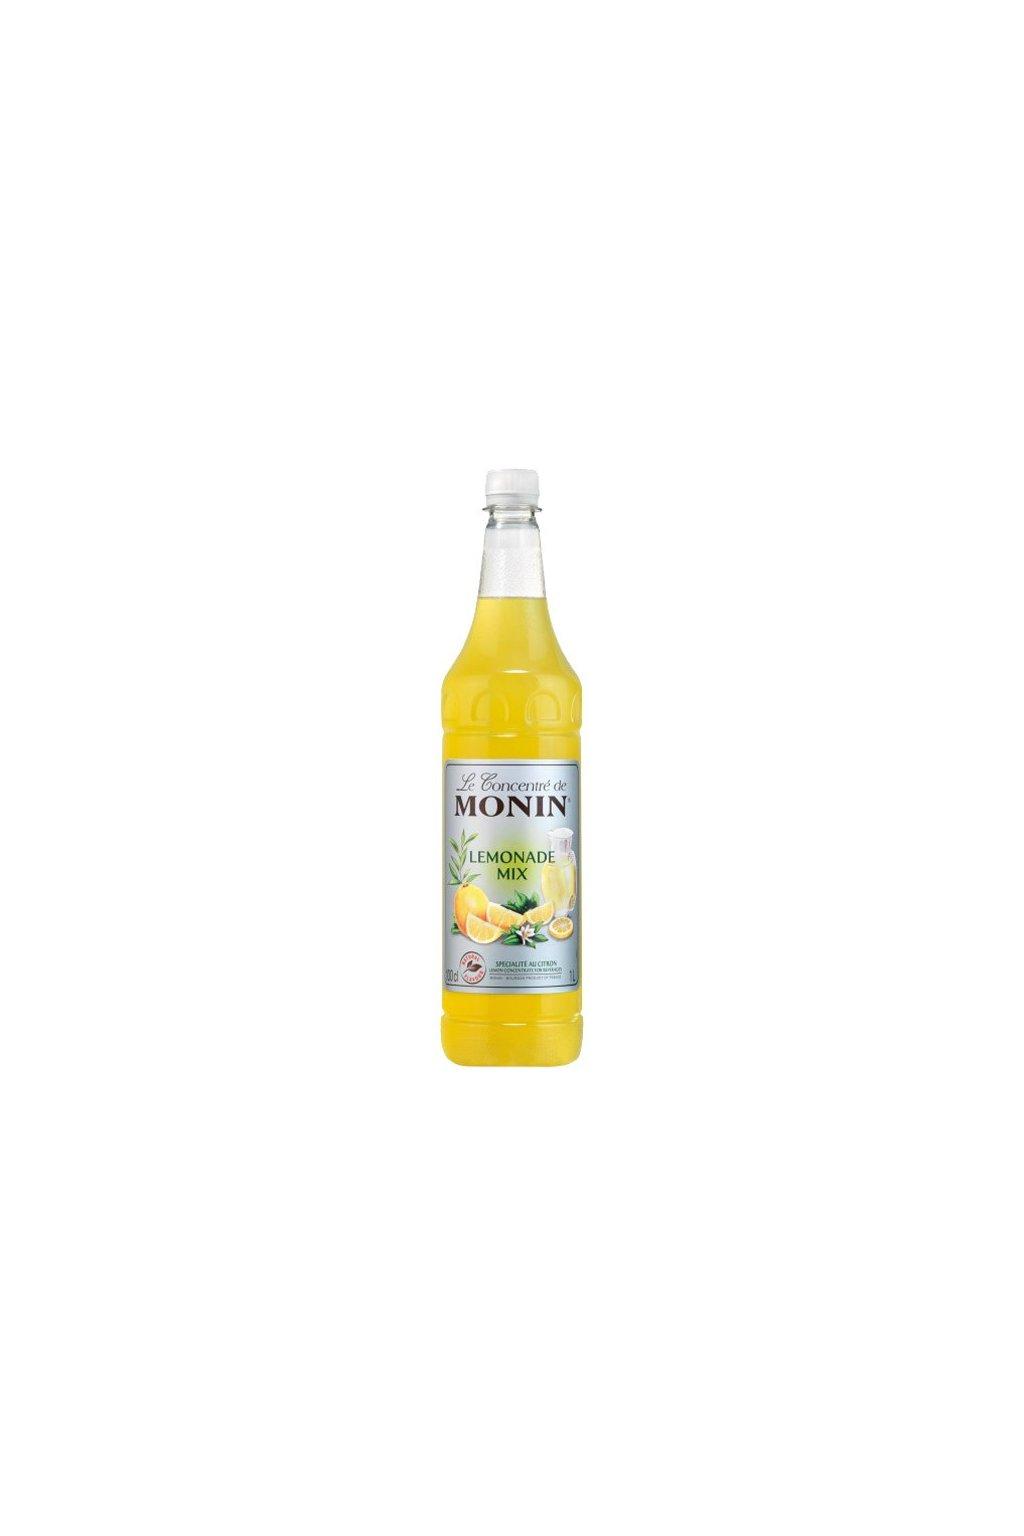 monin lemonade mix